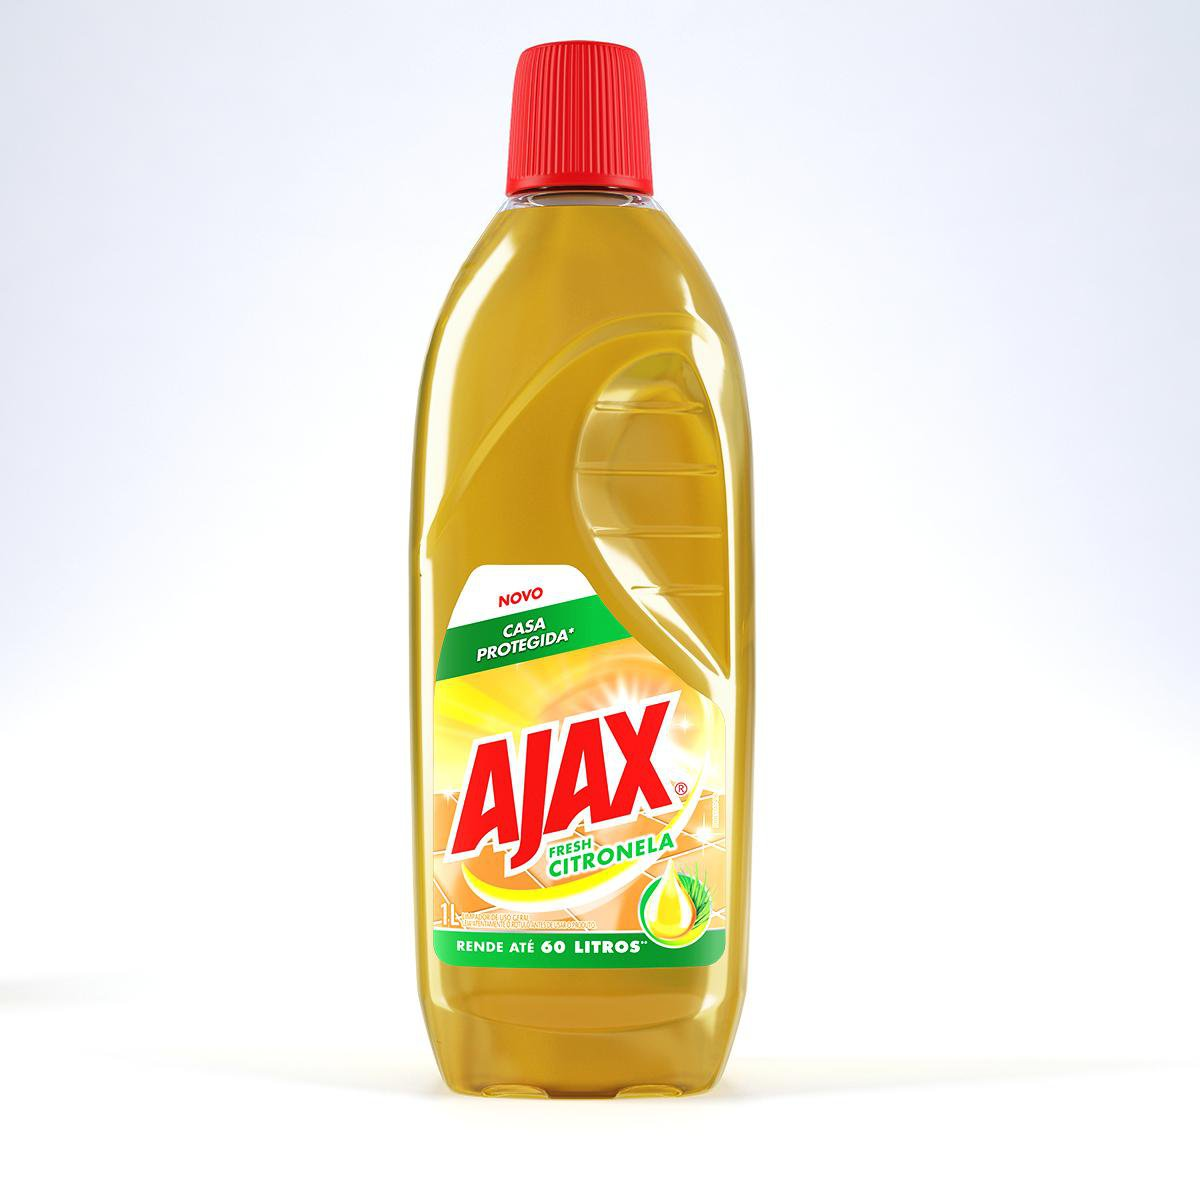 AJAX FRESH CITRONELA 1X1L(12)